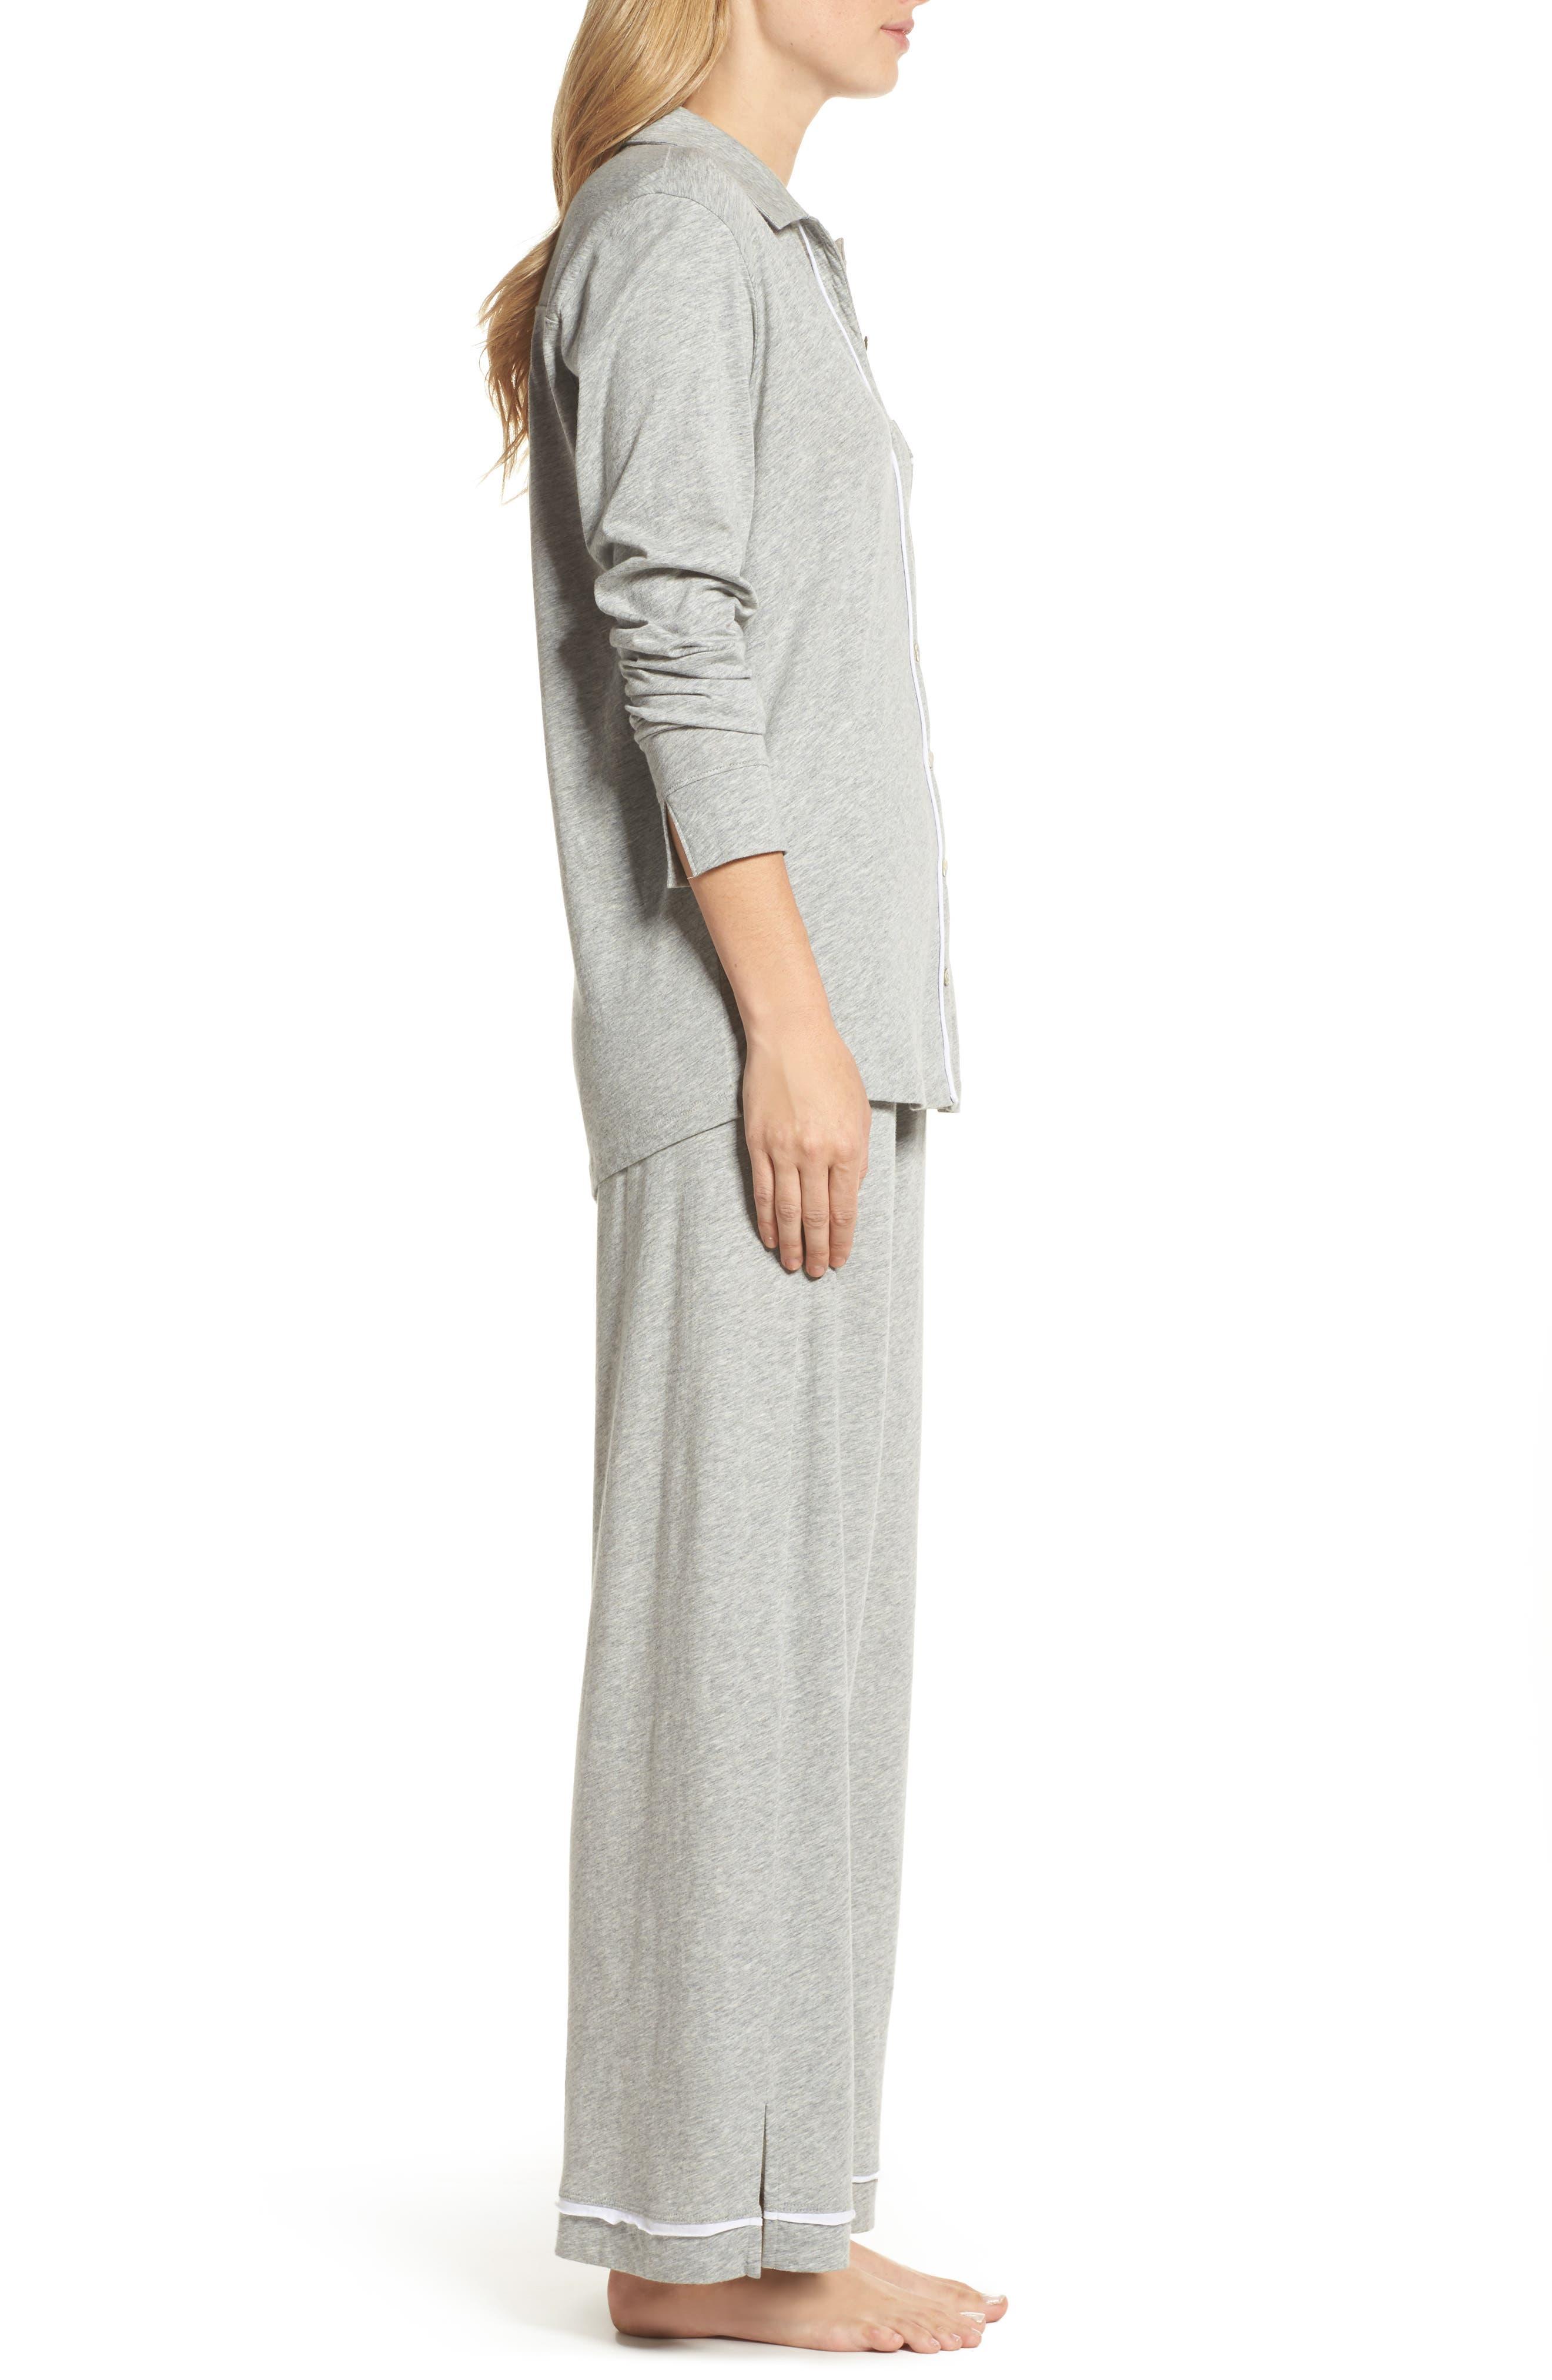 Penelope Pima Cotton Pajamas,                             Alternate thumbnail 3, color,                             020